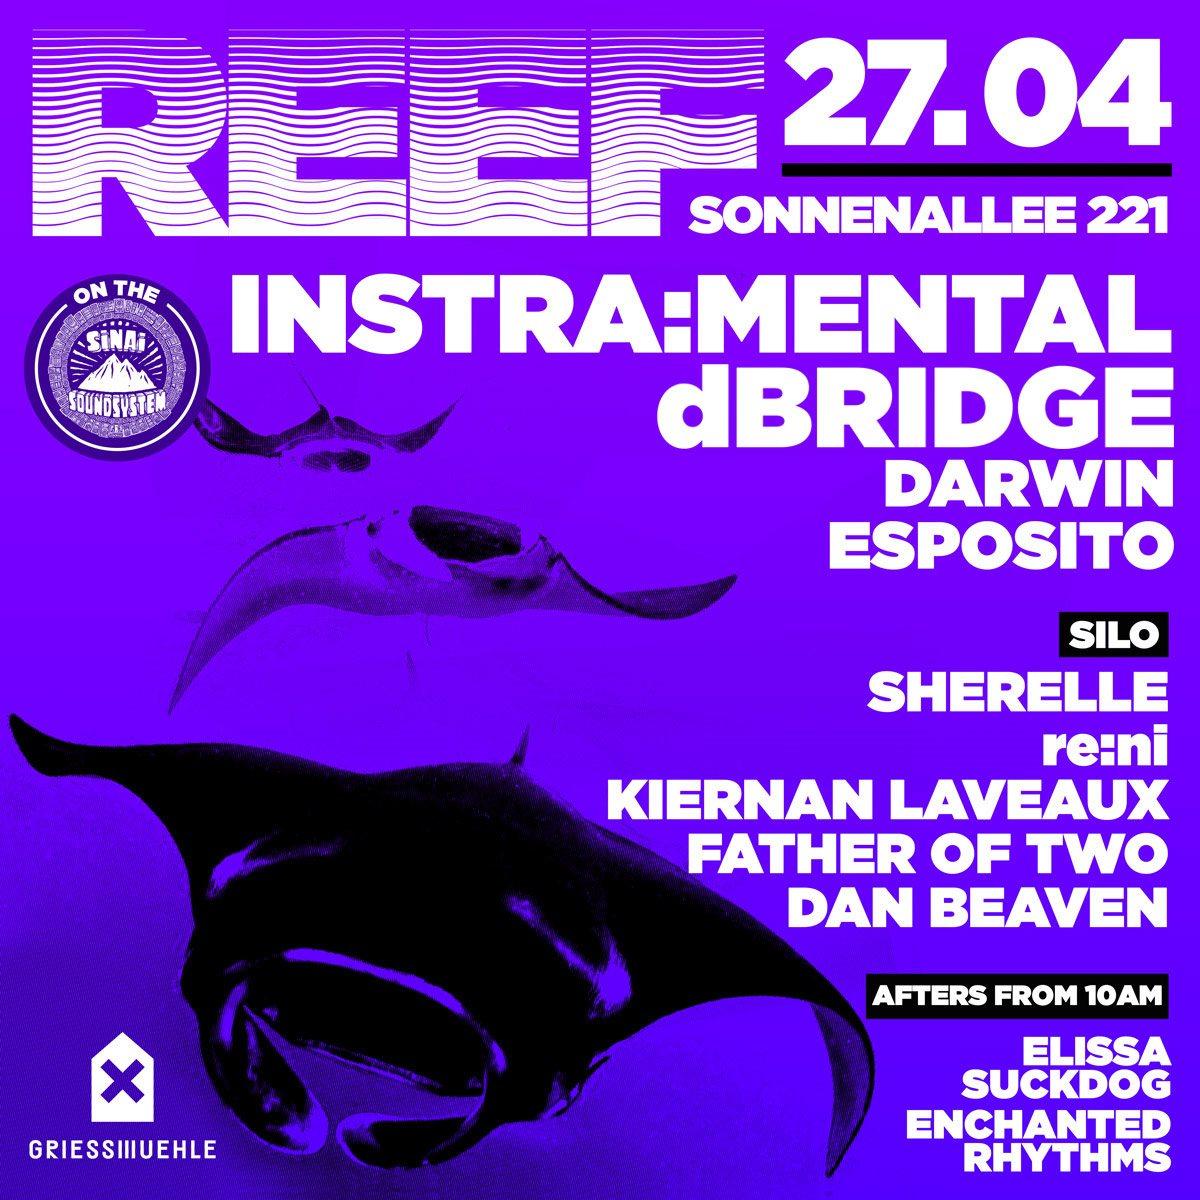 Reef with Instra:mental, dBridge, Sherelle, re:ni, Kiernan Laveaux - Flyer front